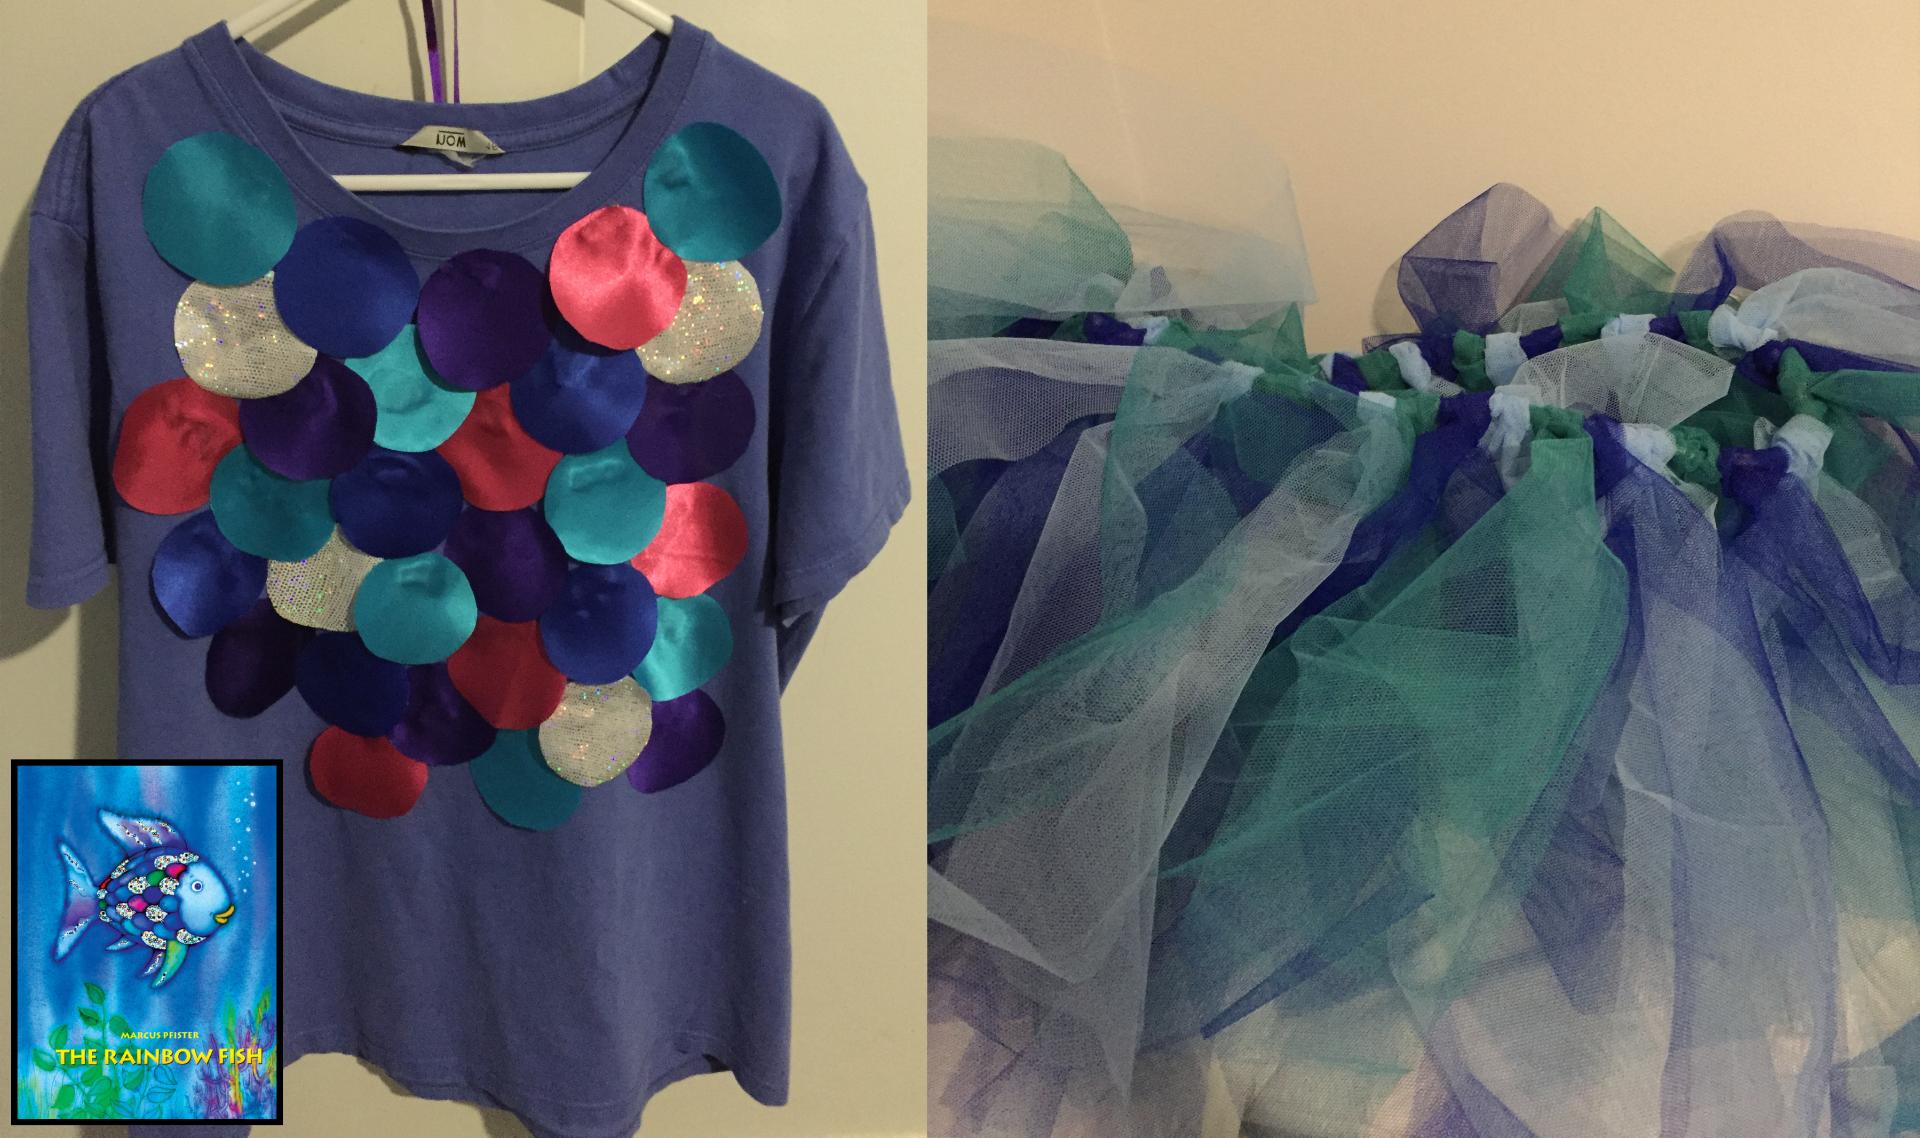 Book u2013 The Rainbow Fish & My Budget No Sew Book Week Costumes | Imaginative Teacher